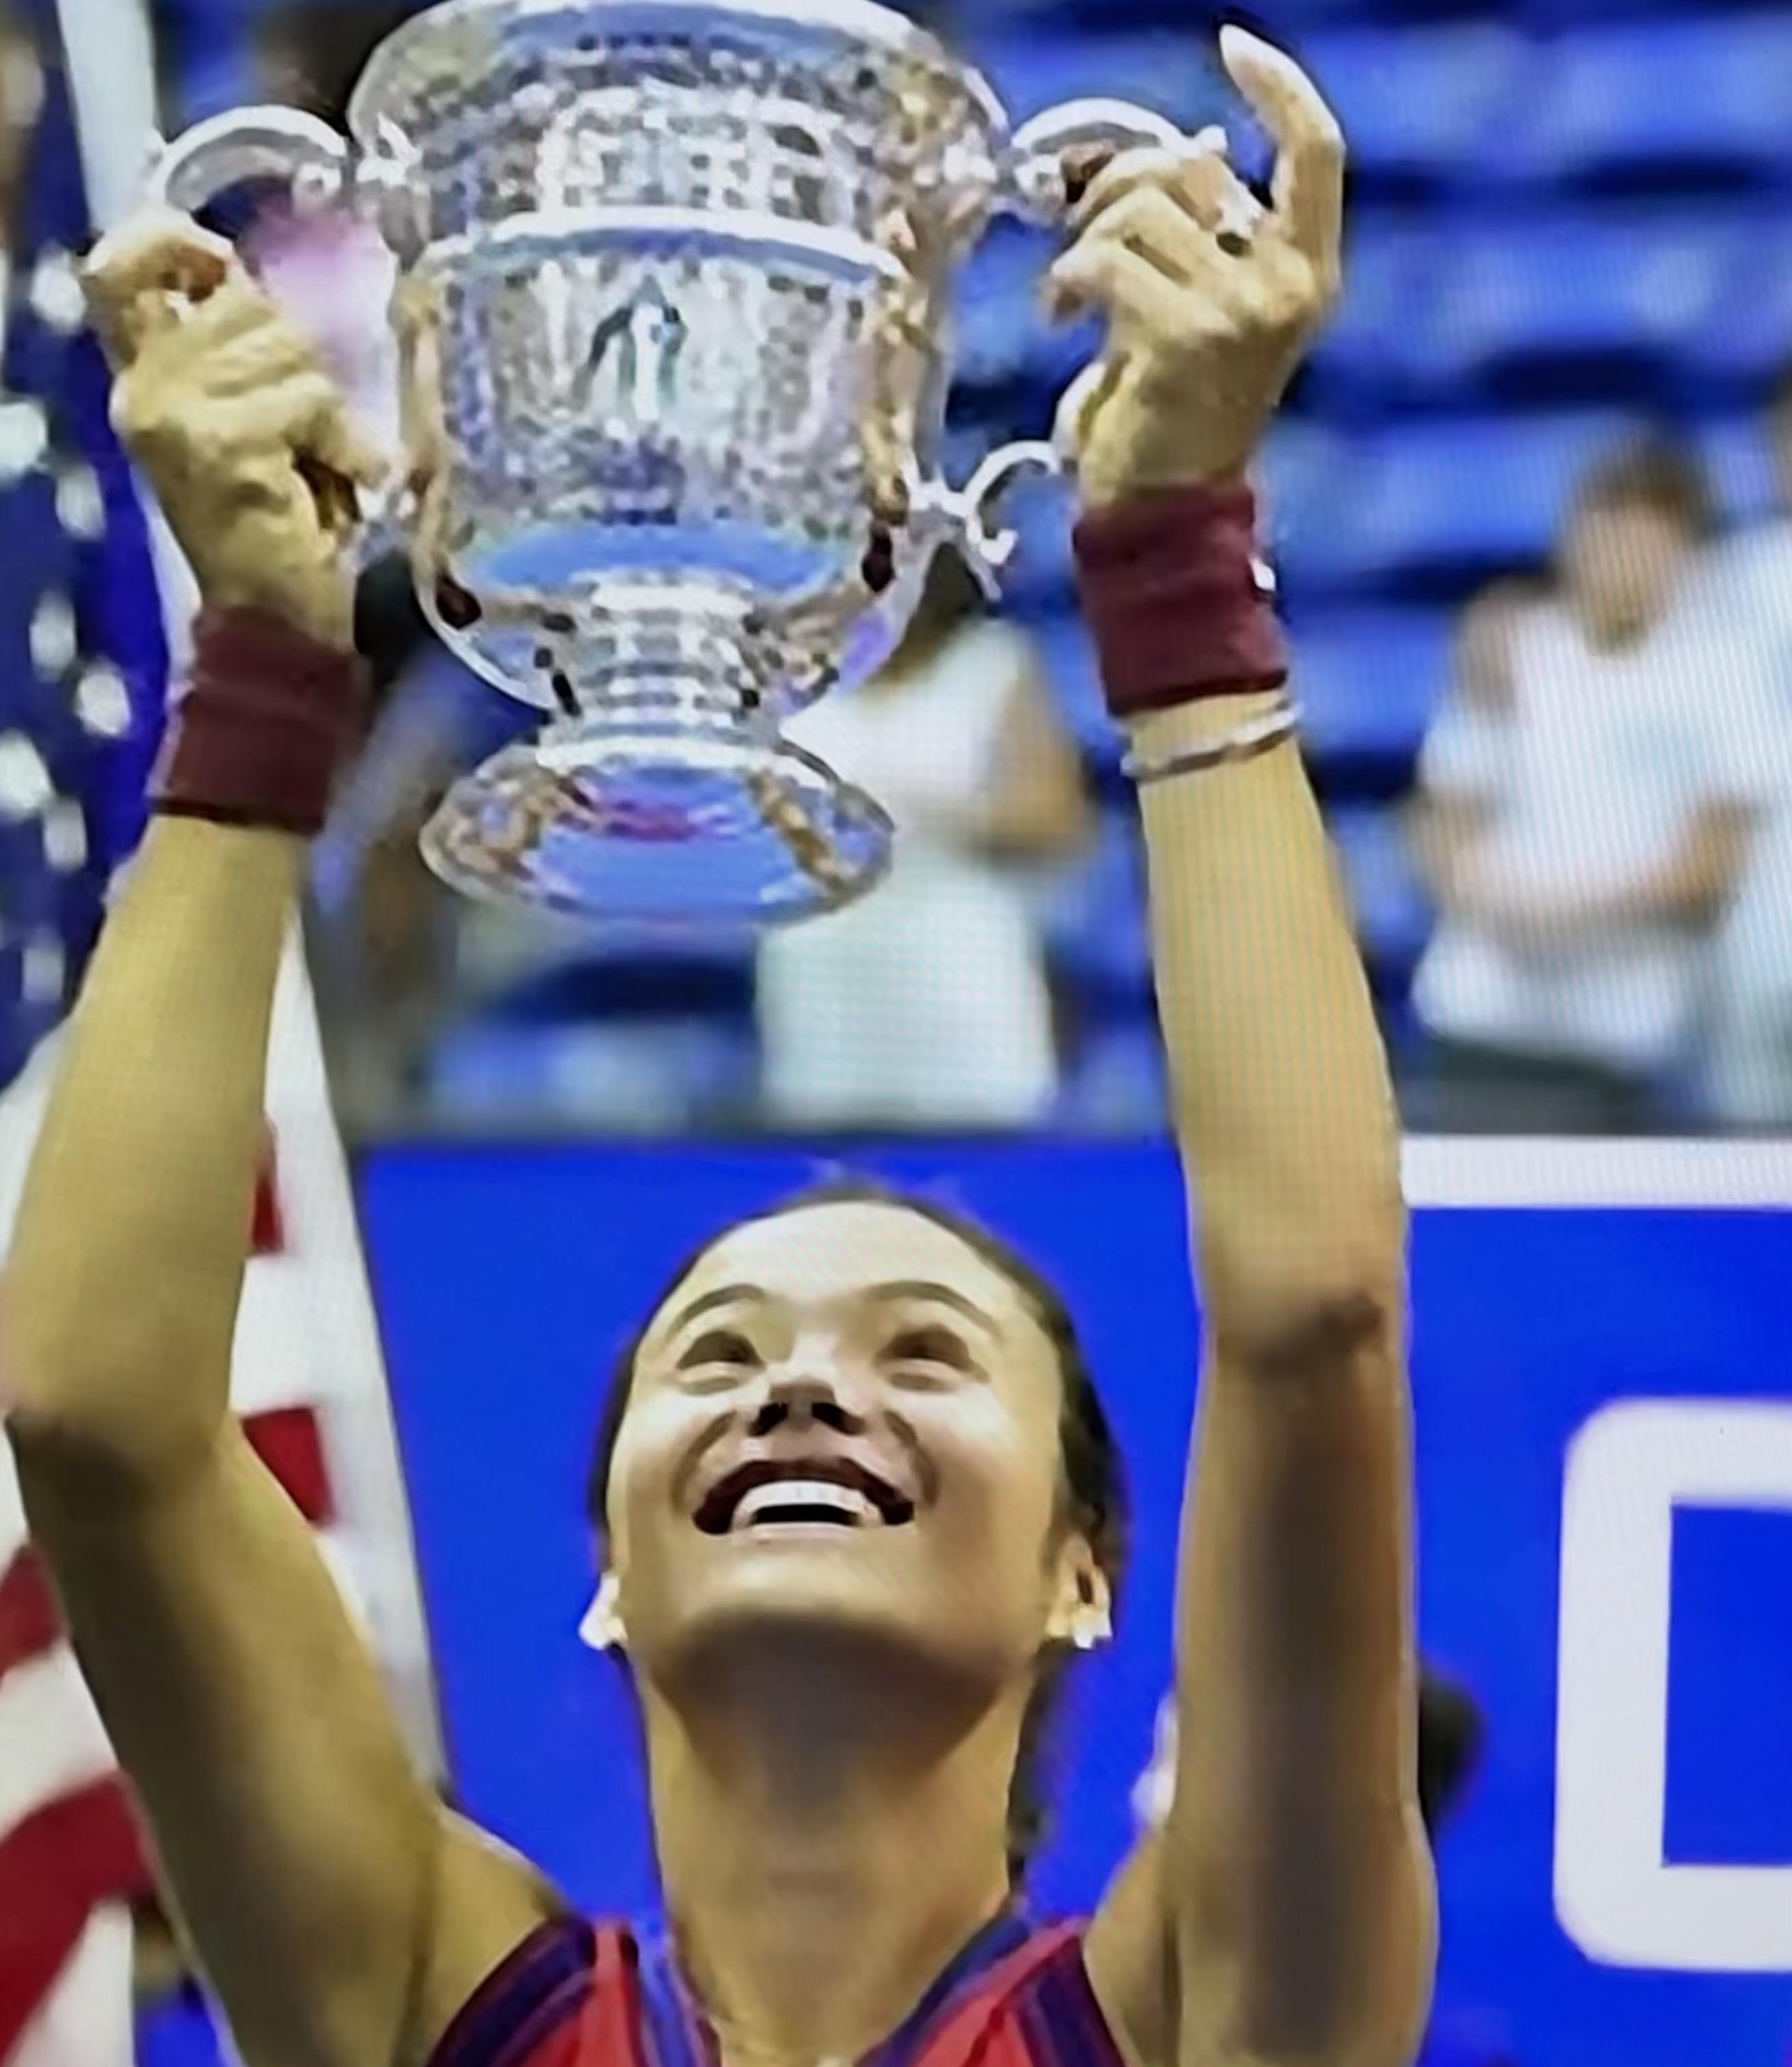 Emma Raducanu lifting the coveted US Open trophy